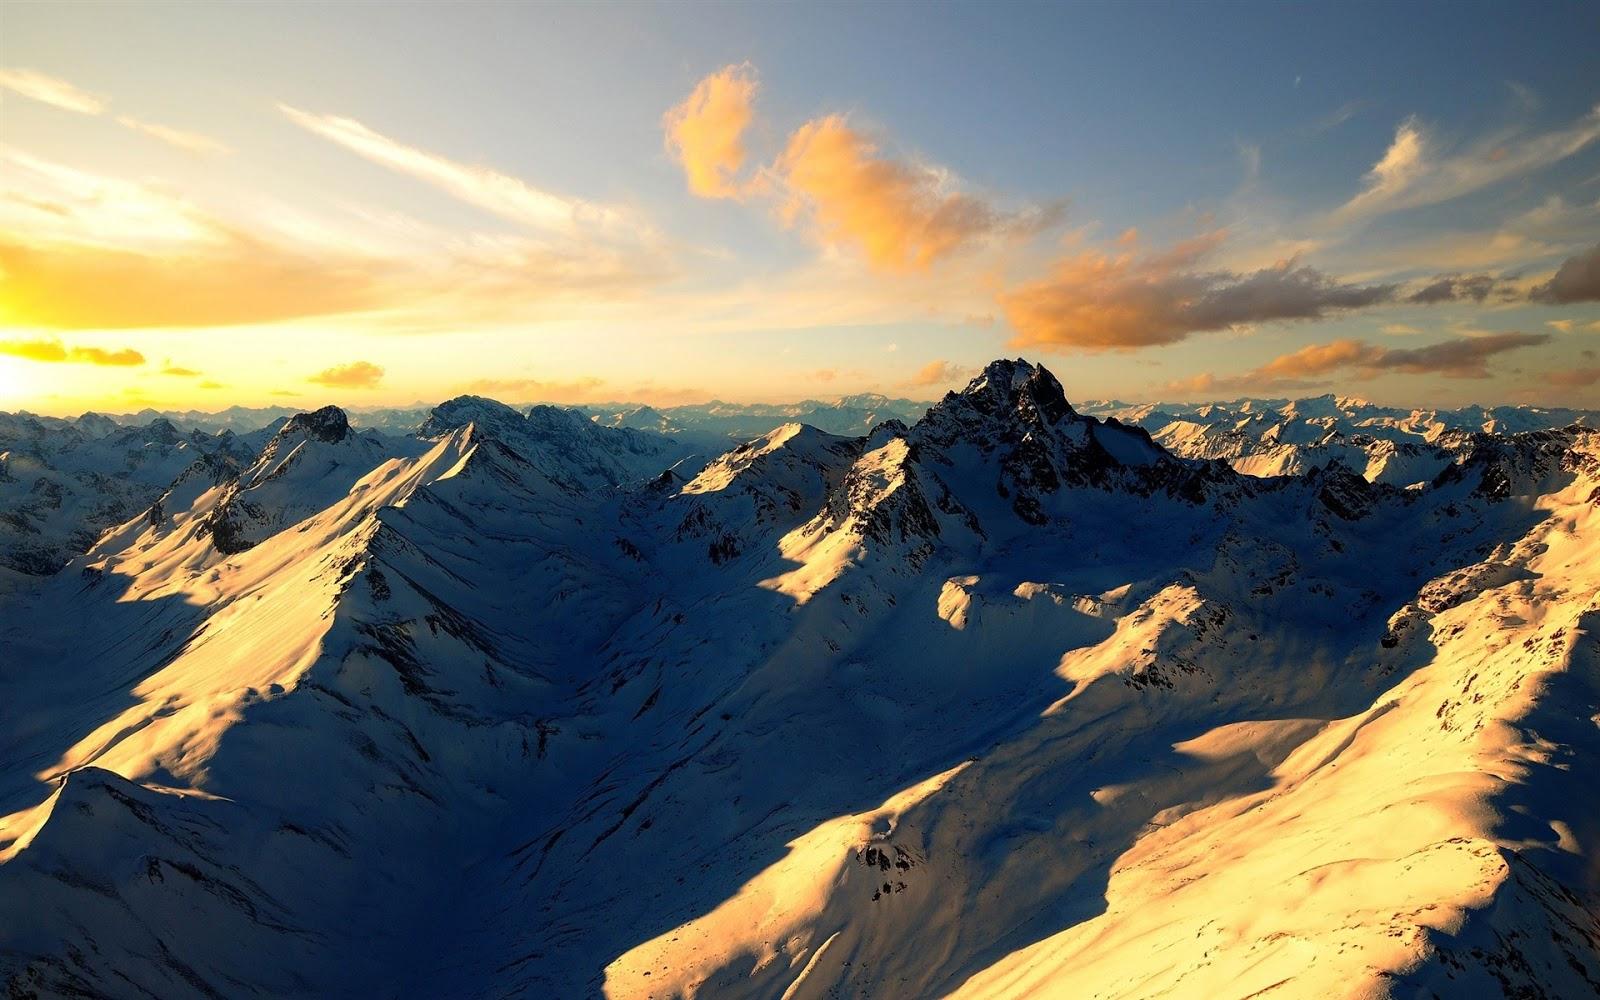 http://3.bp.blogspot.com/-tnVZ8PWx-Vo/UIWUu8LeTLI/AAAAAAAACIM/GJ-XS5s-hrM/s1600/Switzerland+Alps+nature+landscape+wallpaper+(1920+x+1200).jpg